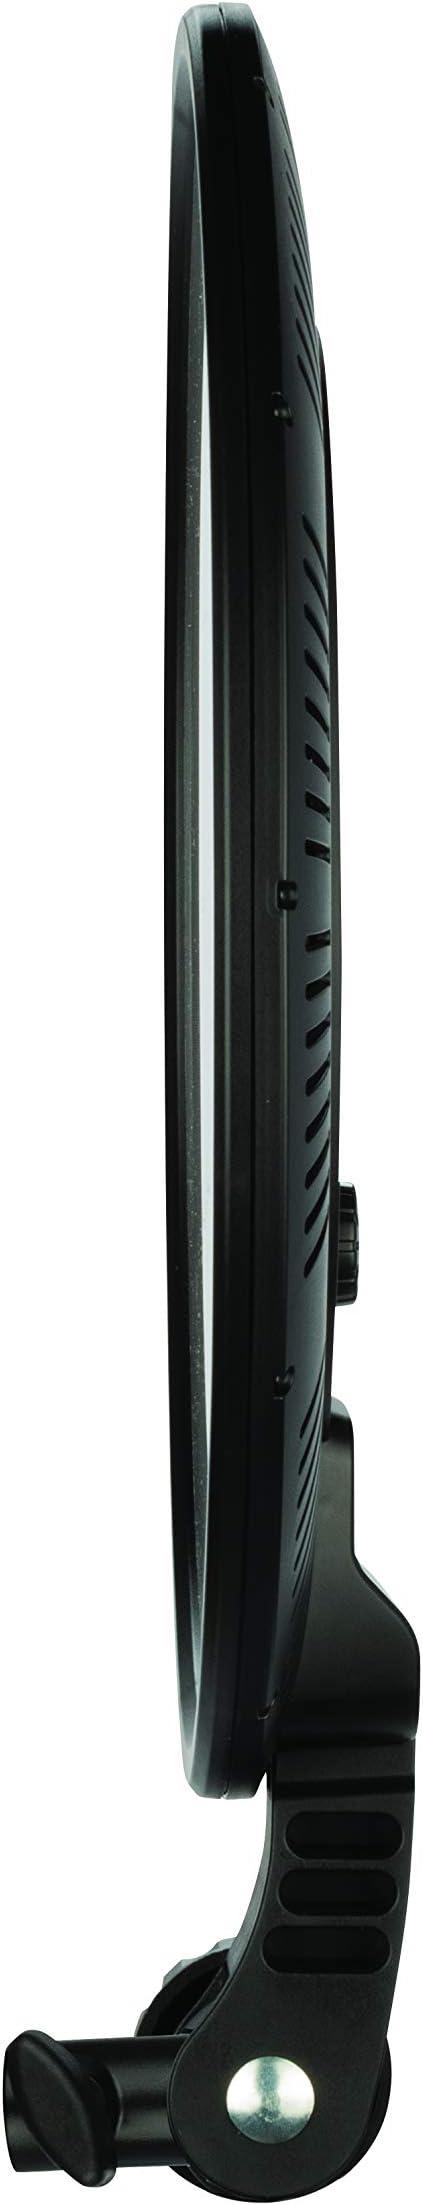 Edge 360 LED Flat Panel Light 13, Daylight Balanced